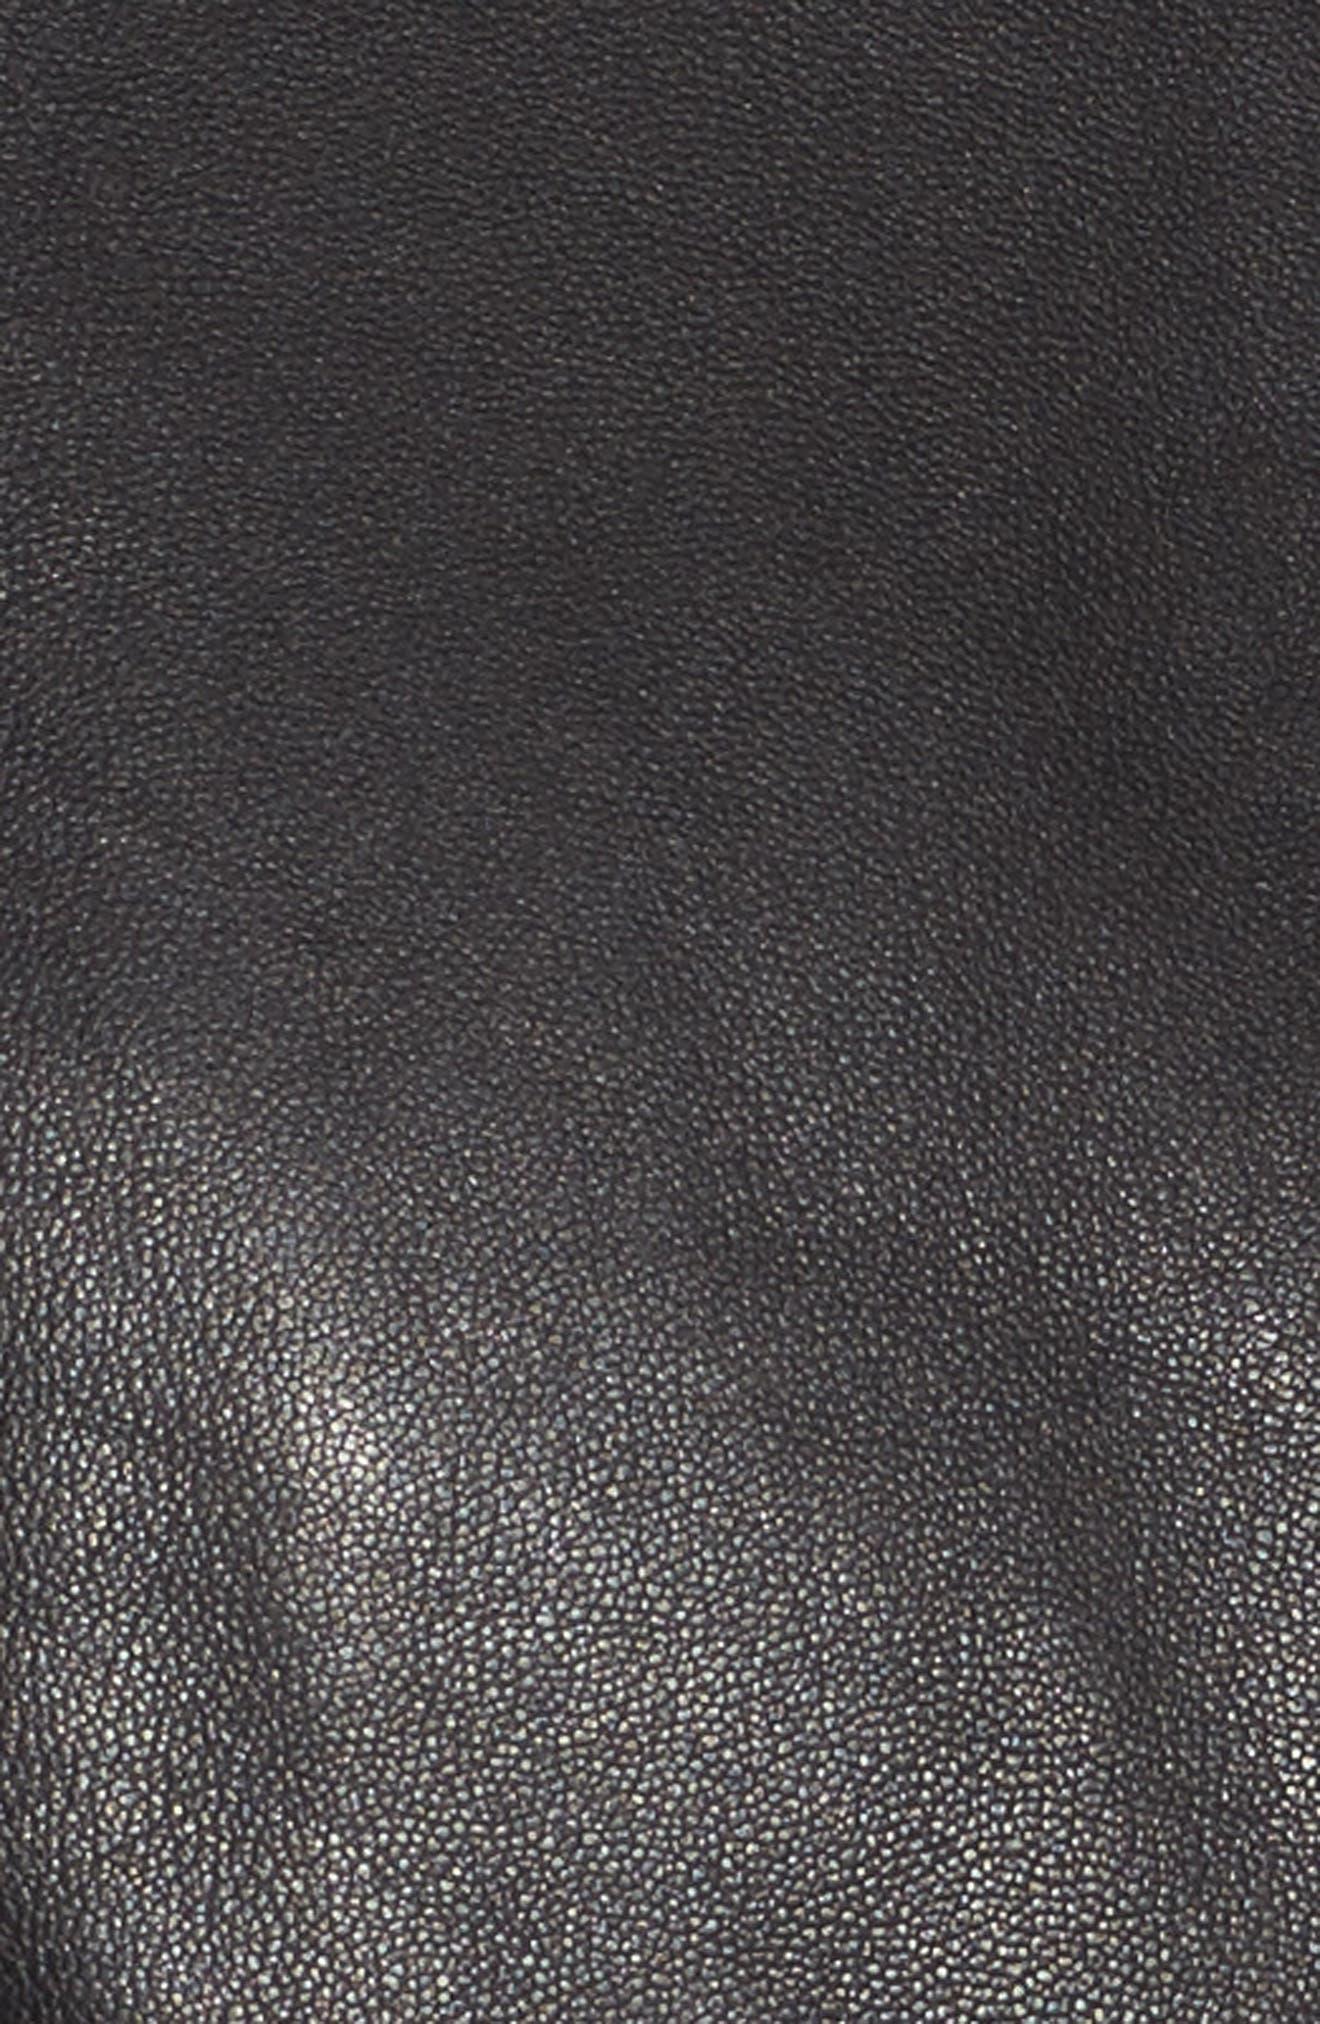 Quilted Sleeve Leather Biker Jacket,                             Alternate thumbnail 5, color,                             Black